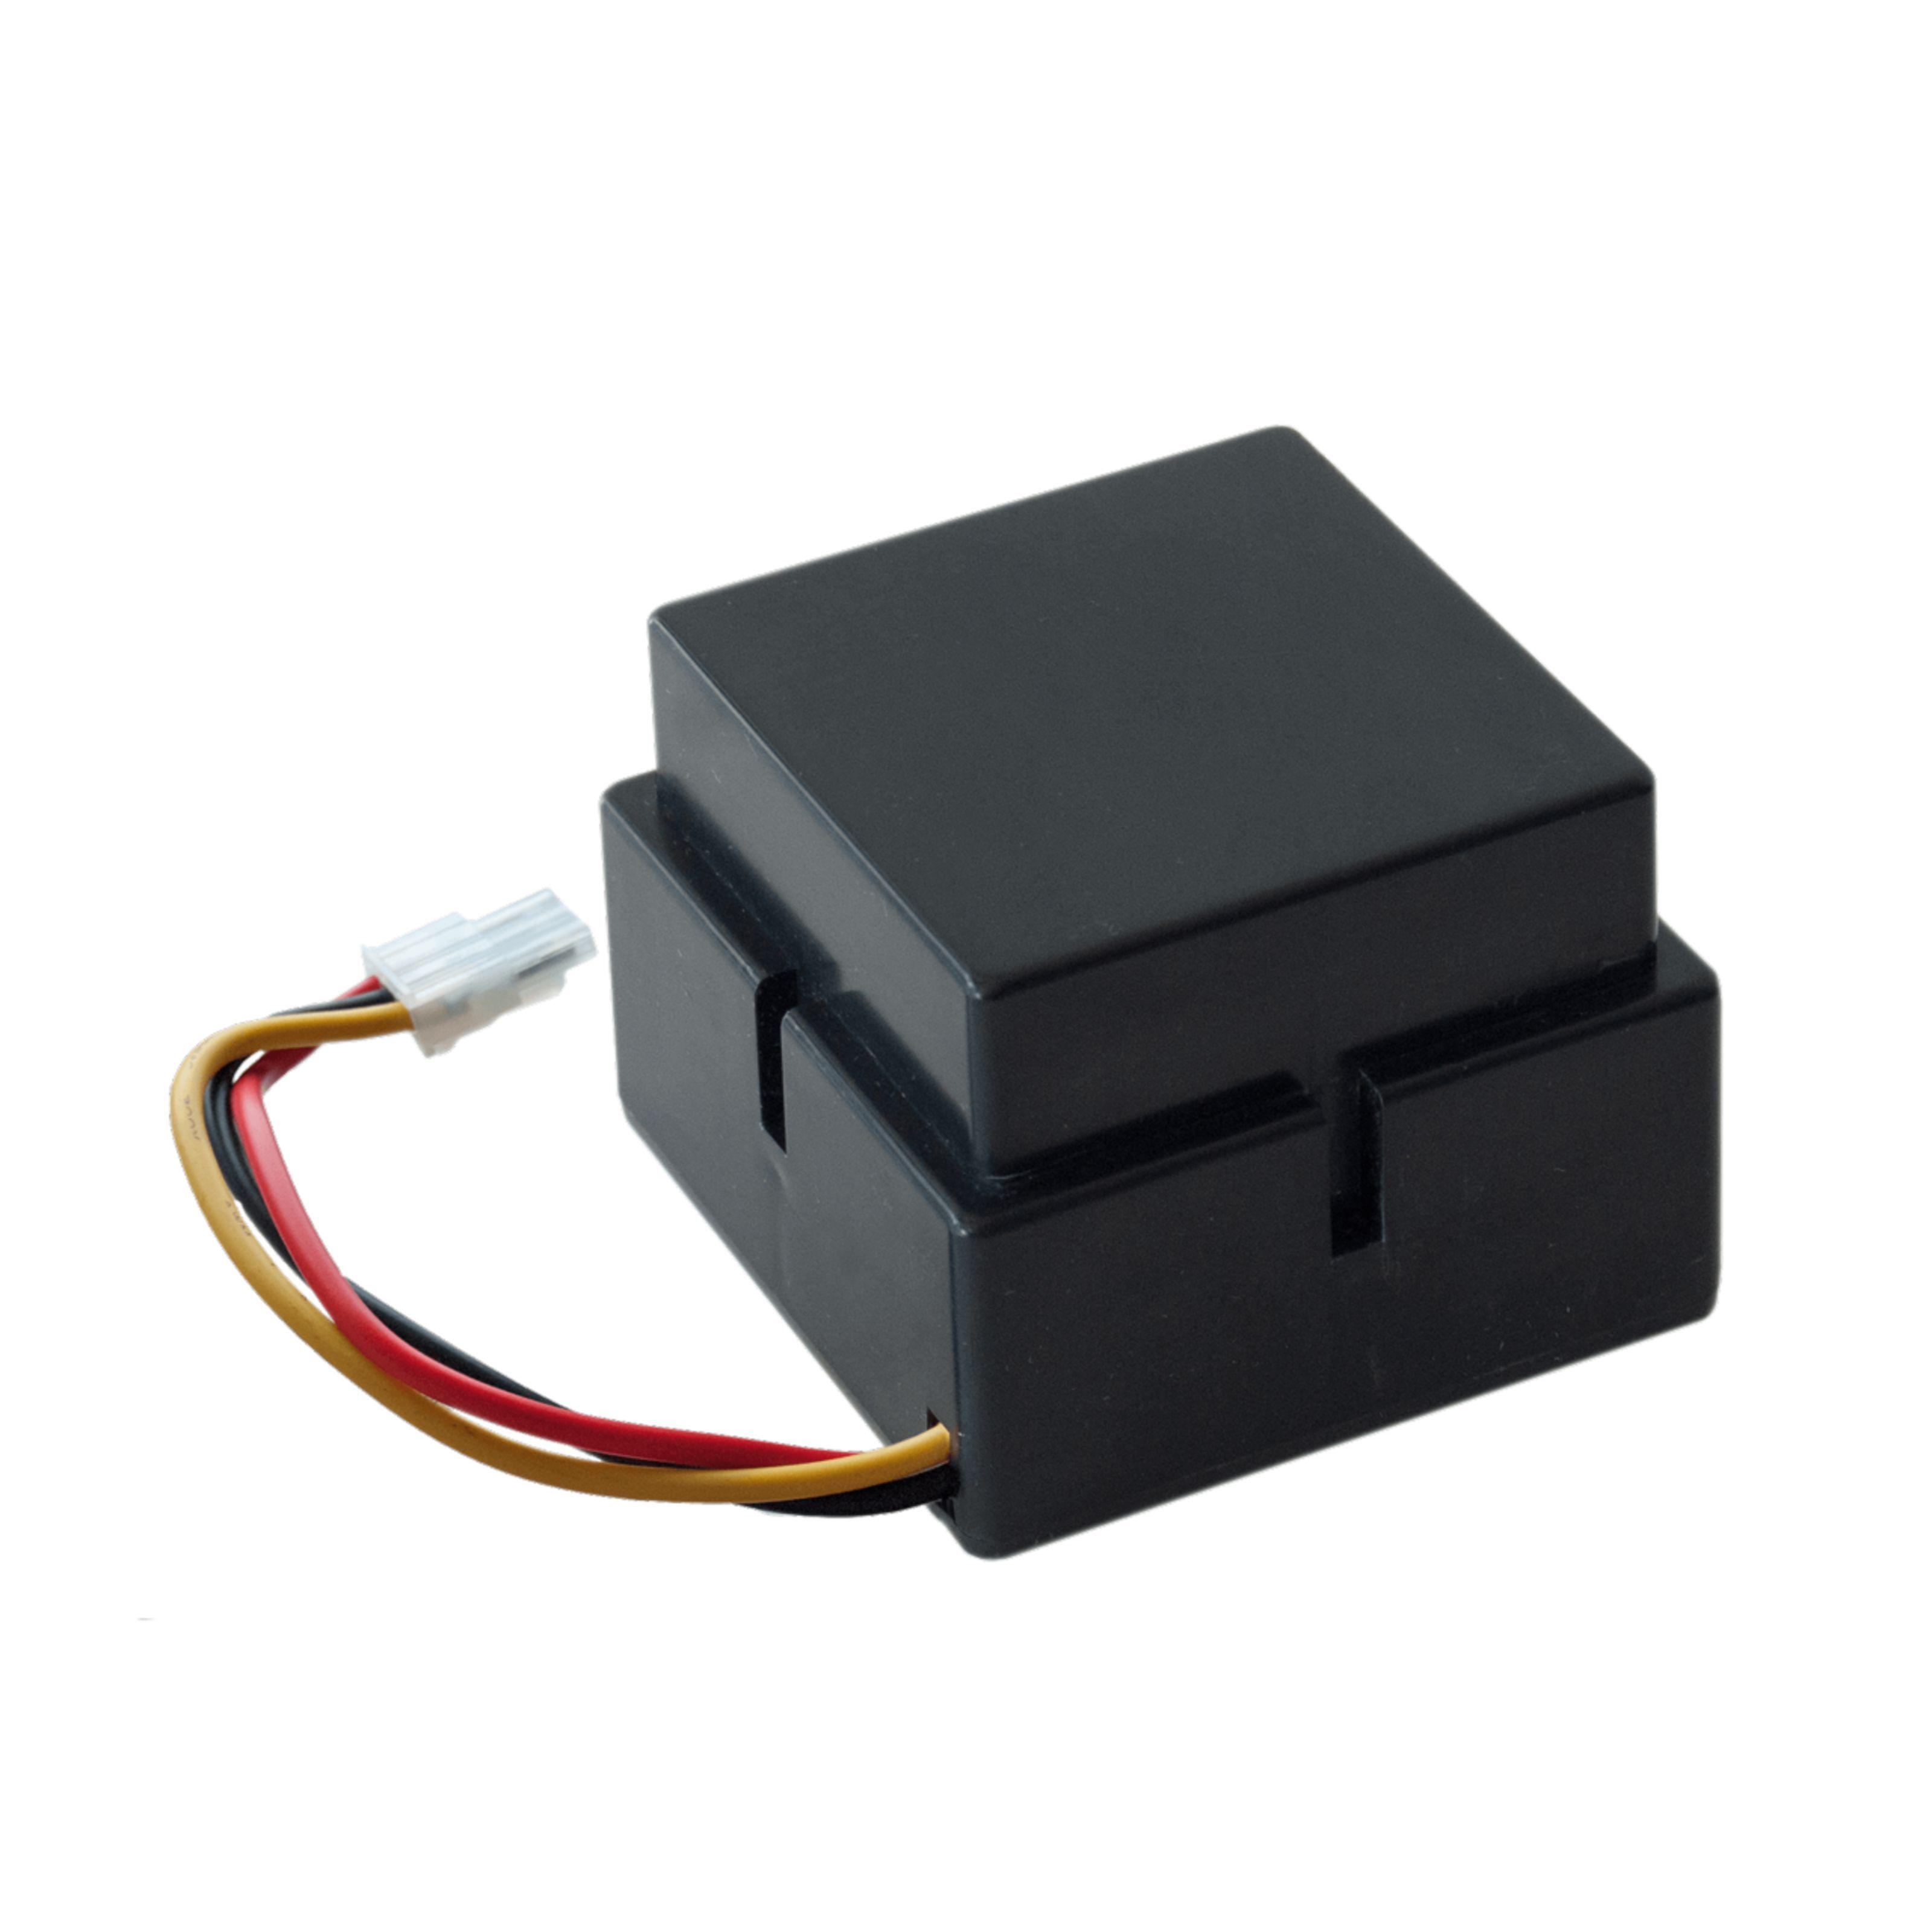 JVC - BN-R5000